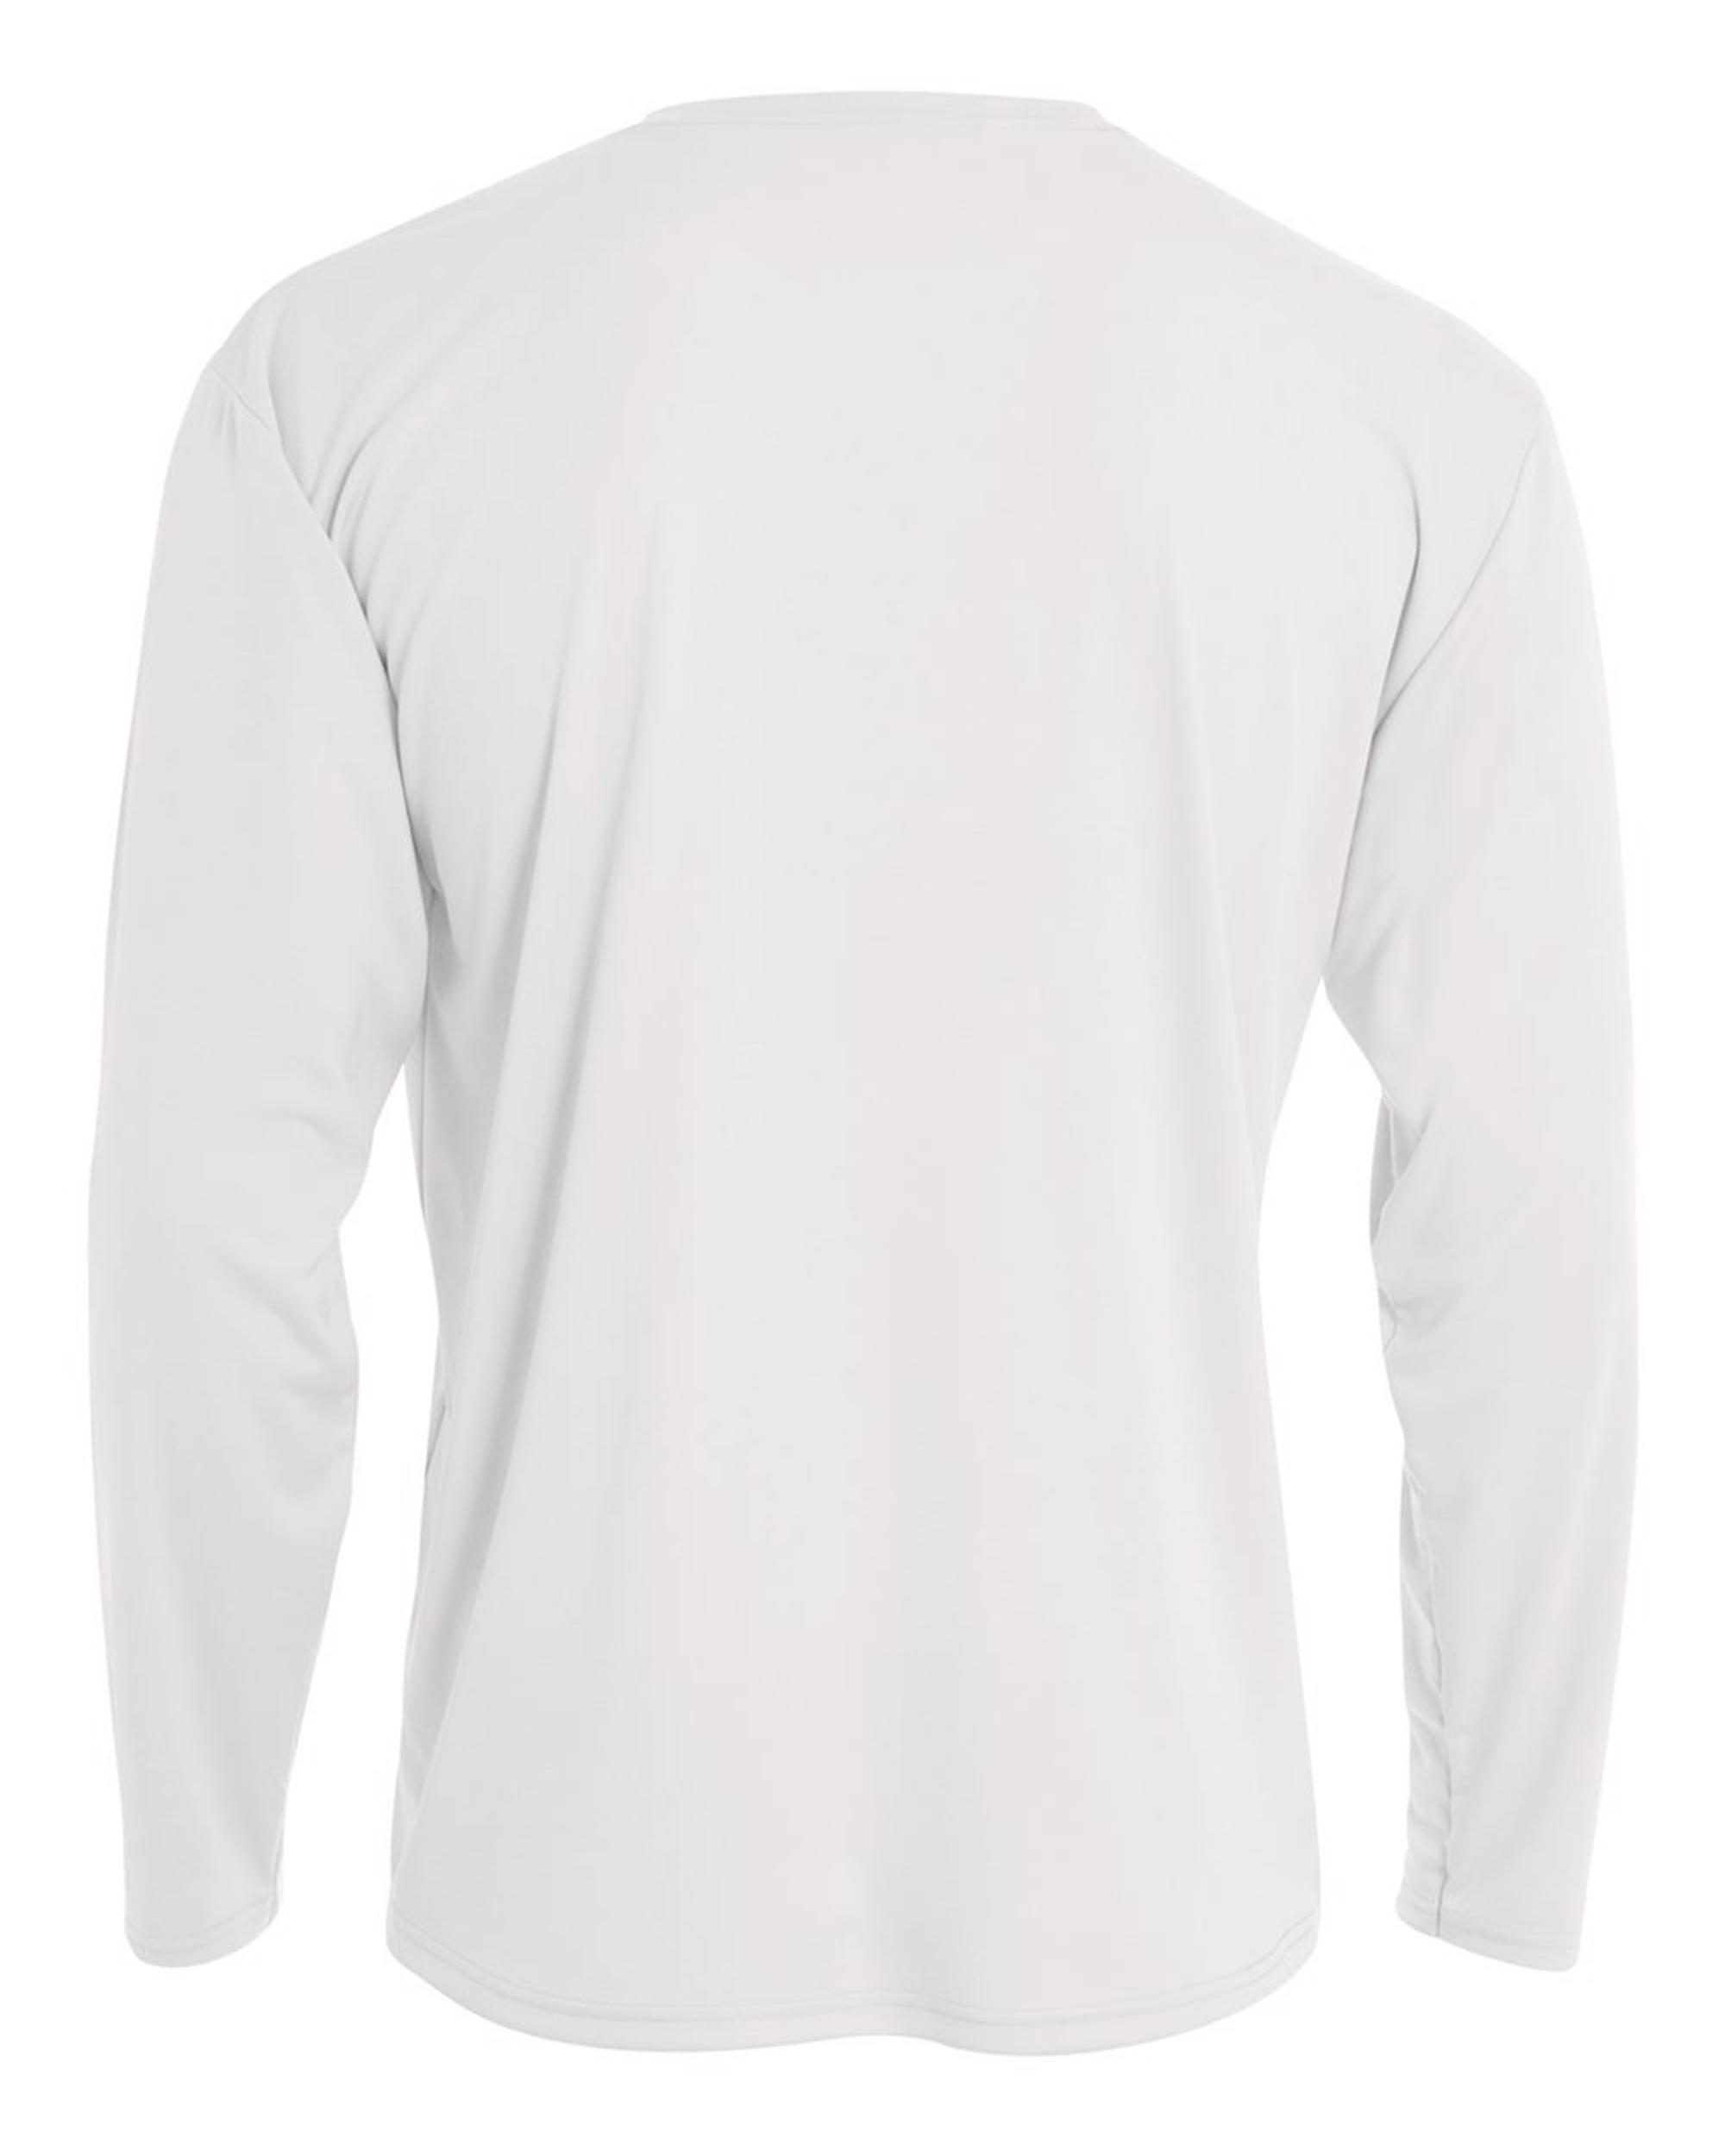 Men-039-s-Long-Sleeve-Loose-Fit-Rash-Guard-Surf-Shirt-Water-Sports-Swimwear thumbnail 26